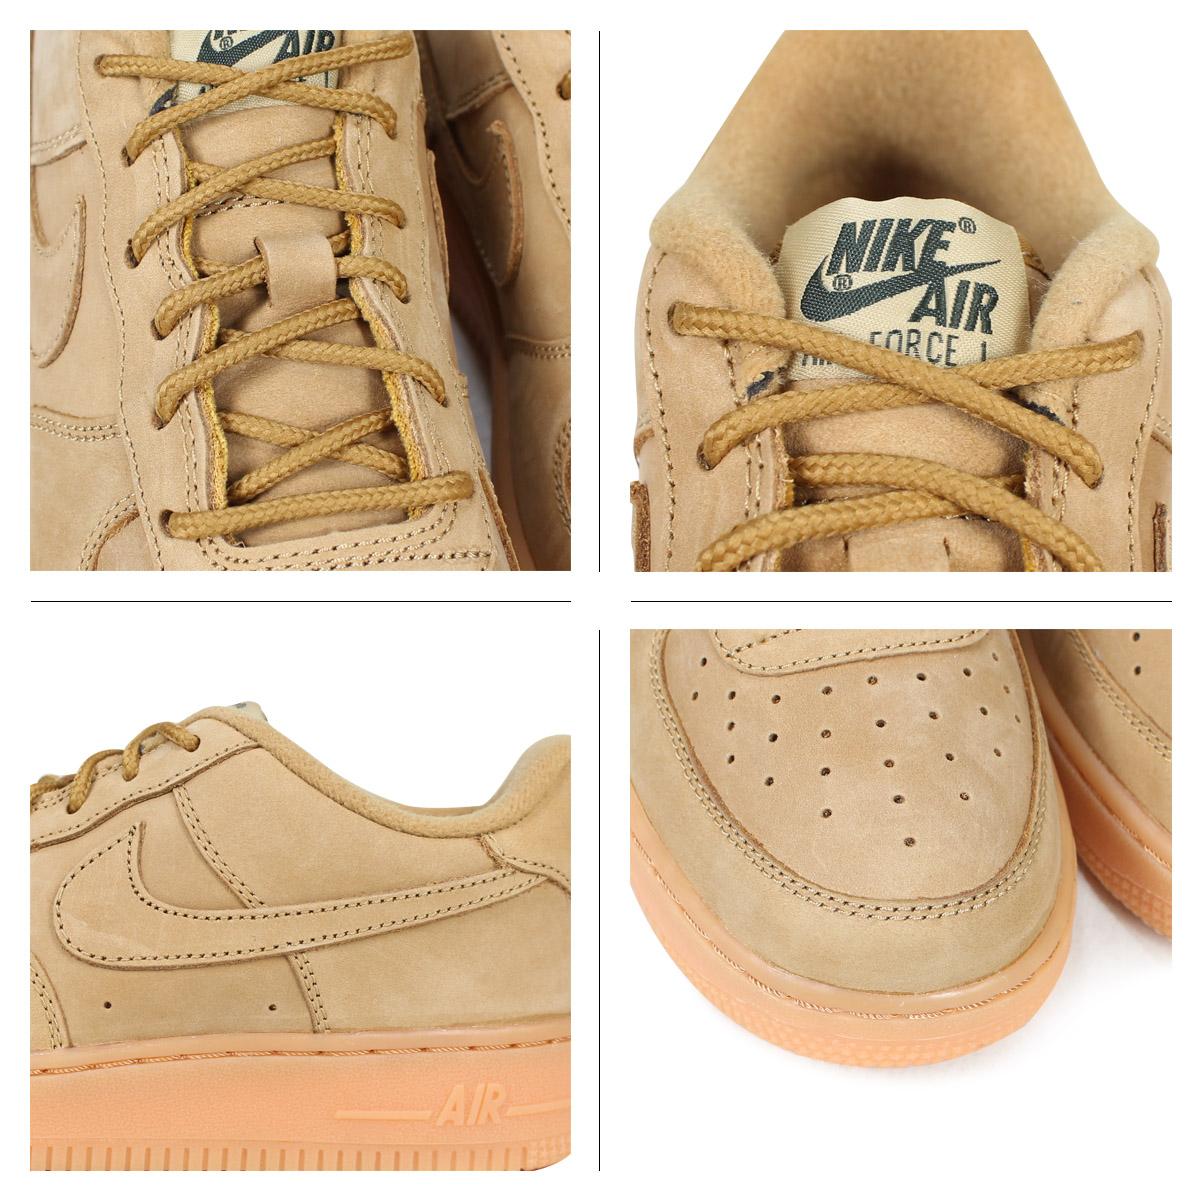 sale retailer 27b87 25b69 NIKE AIR FORCE 1 LOW WINTER PREMIUM GS WHEAT Nike air force 1 lady s  sneakers 943,312-200 beige  2 28 Shinnyu load   182